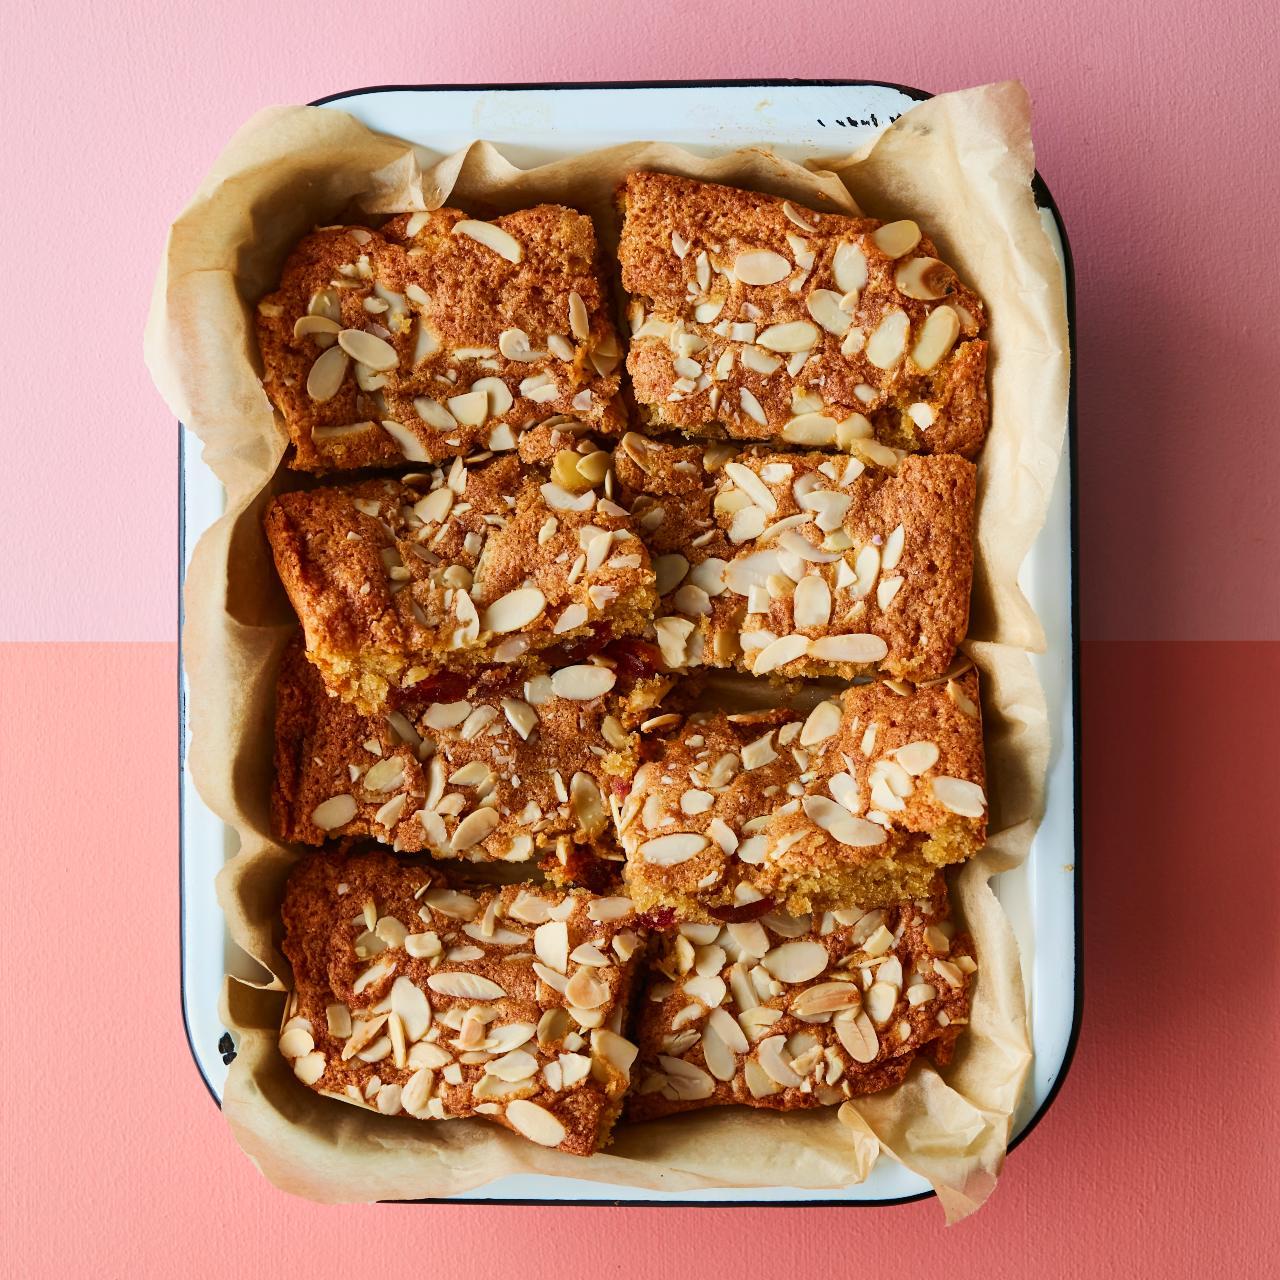 Cherry and almond cake (Image: David Loftus)